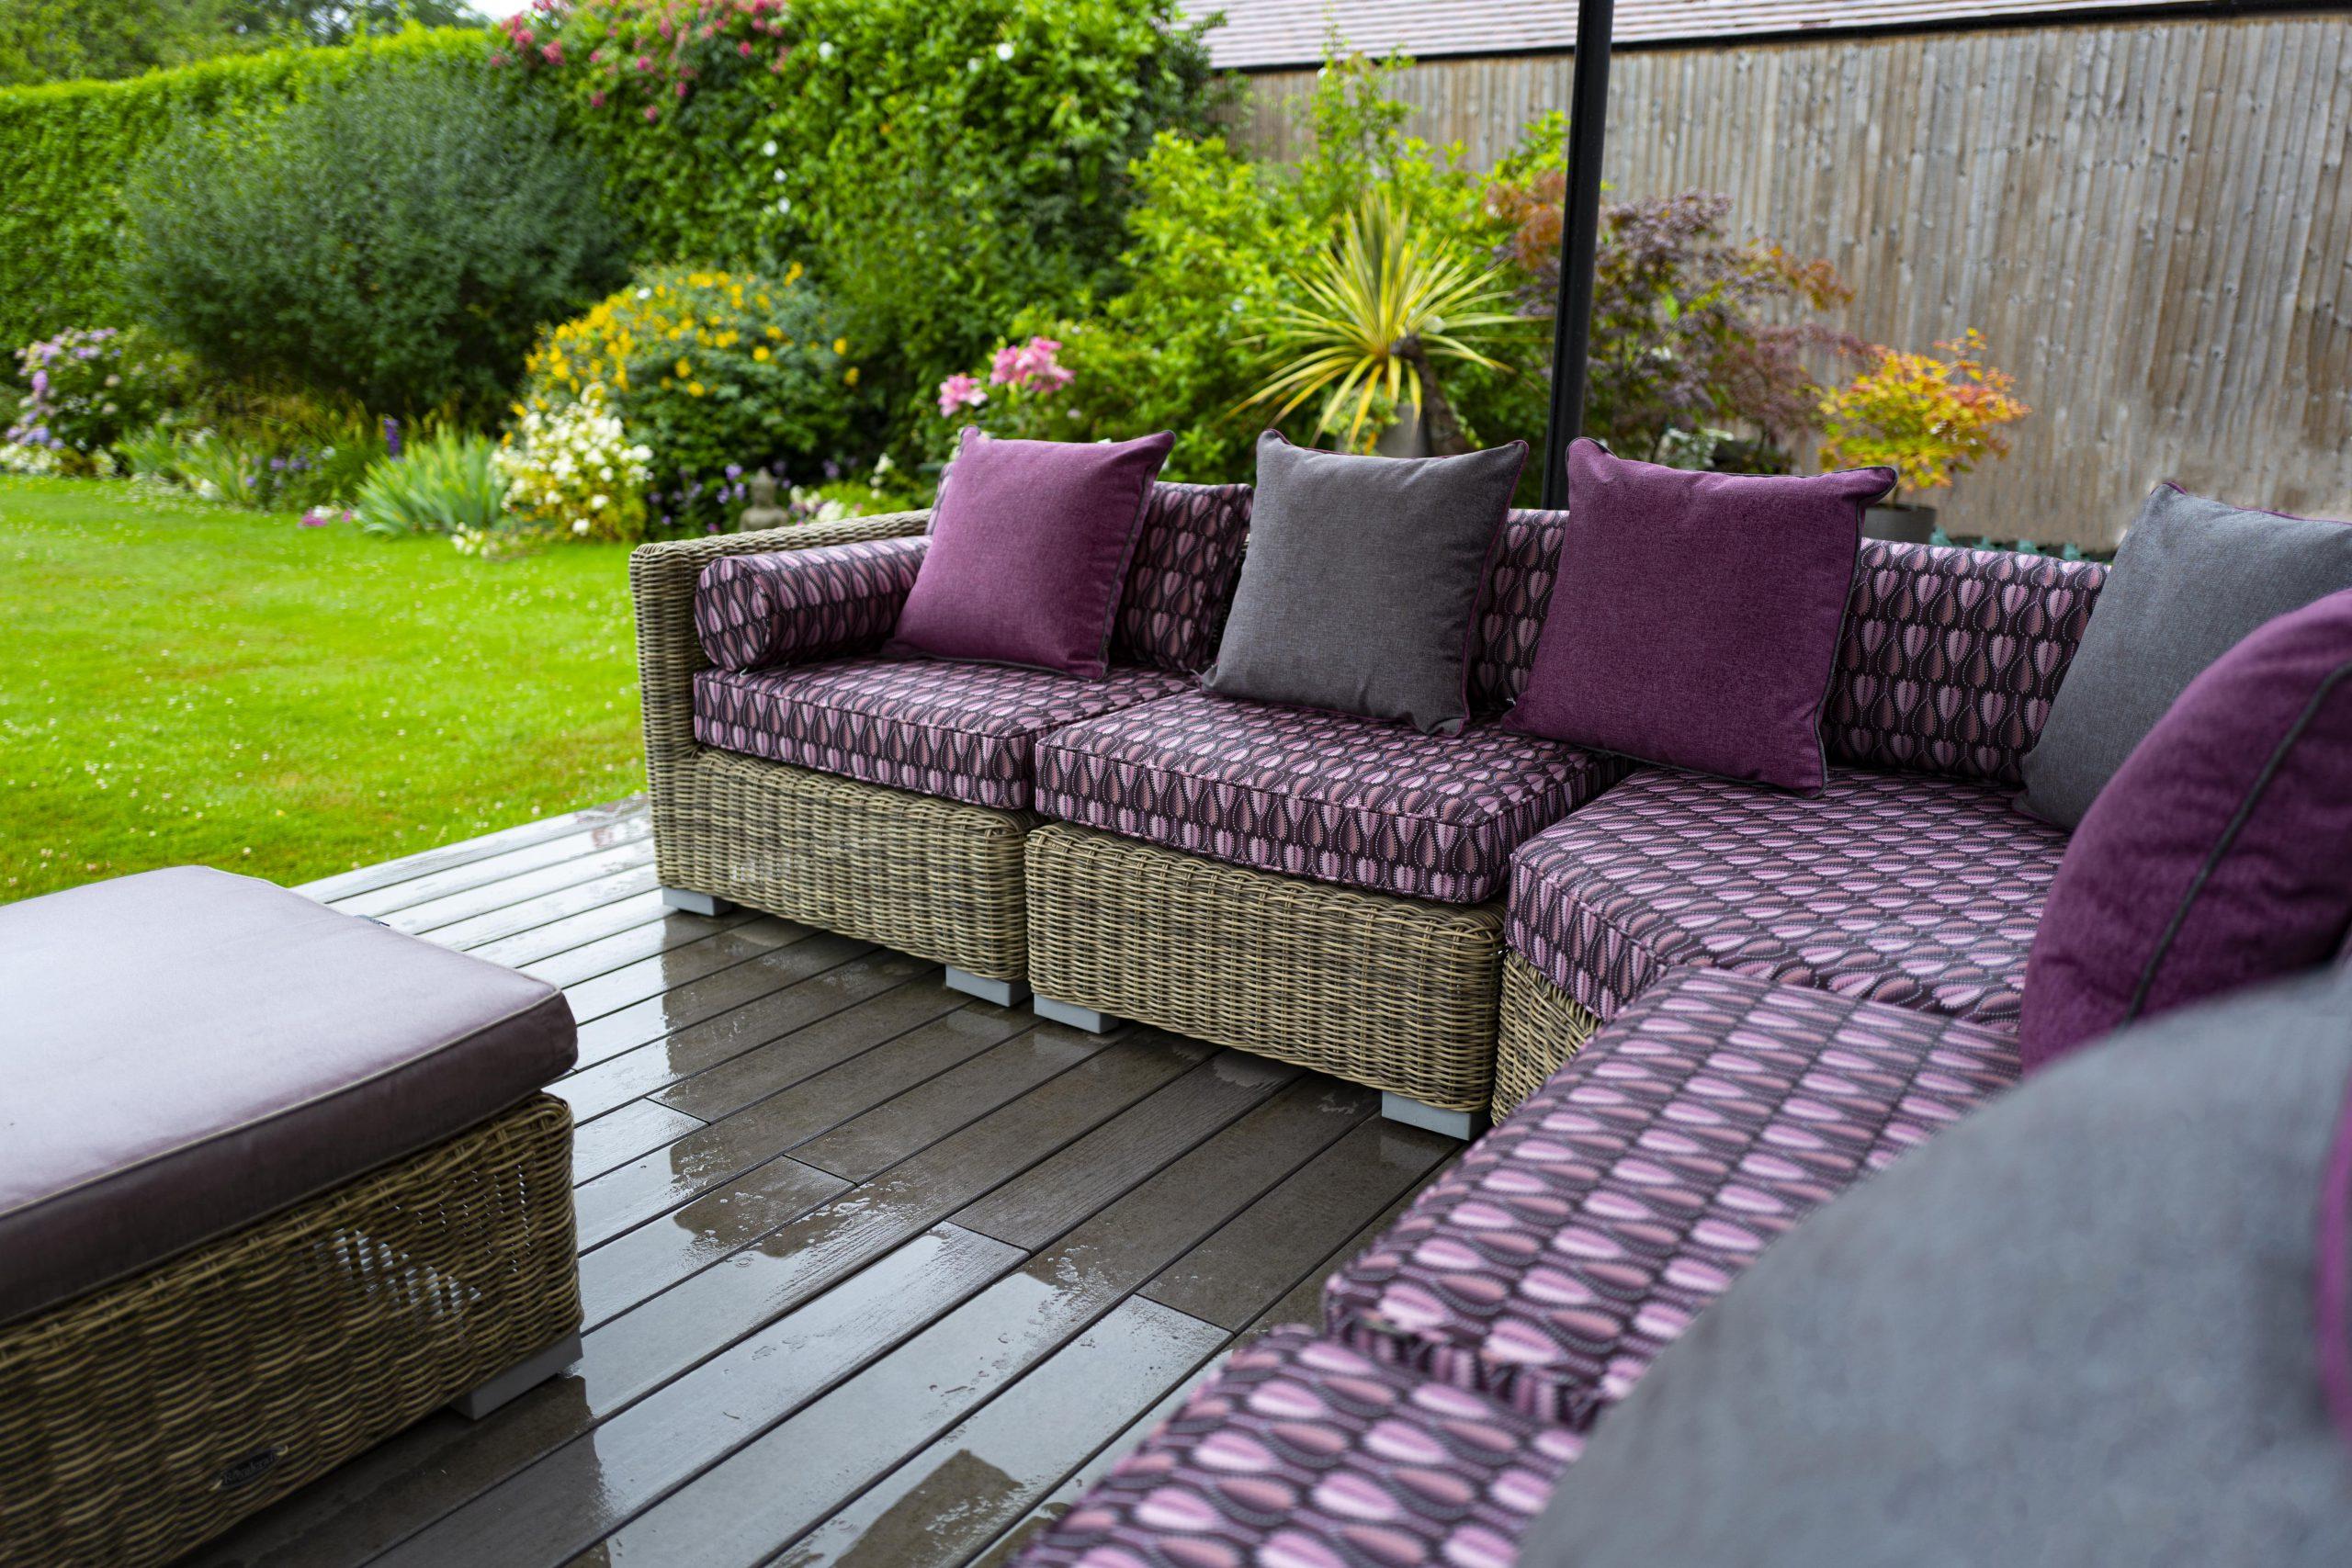 Hotel Outdoor Cushions, Luxury Hotel Cushions